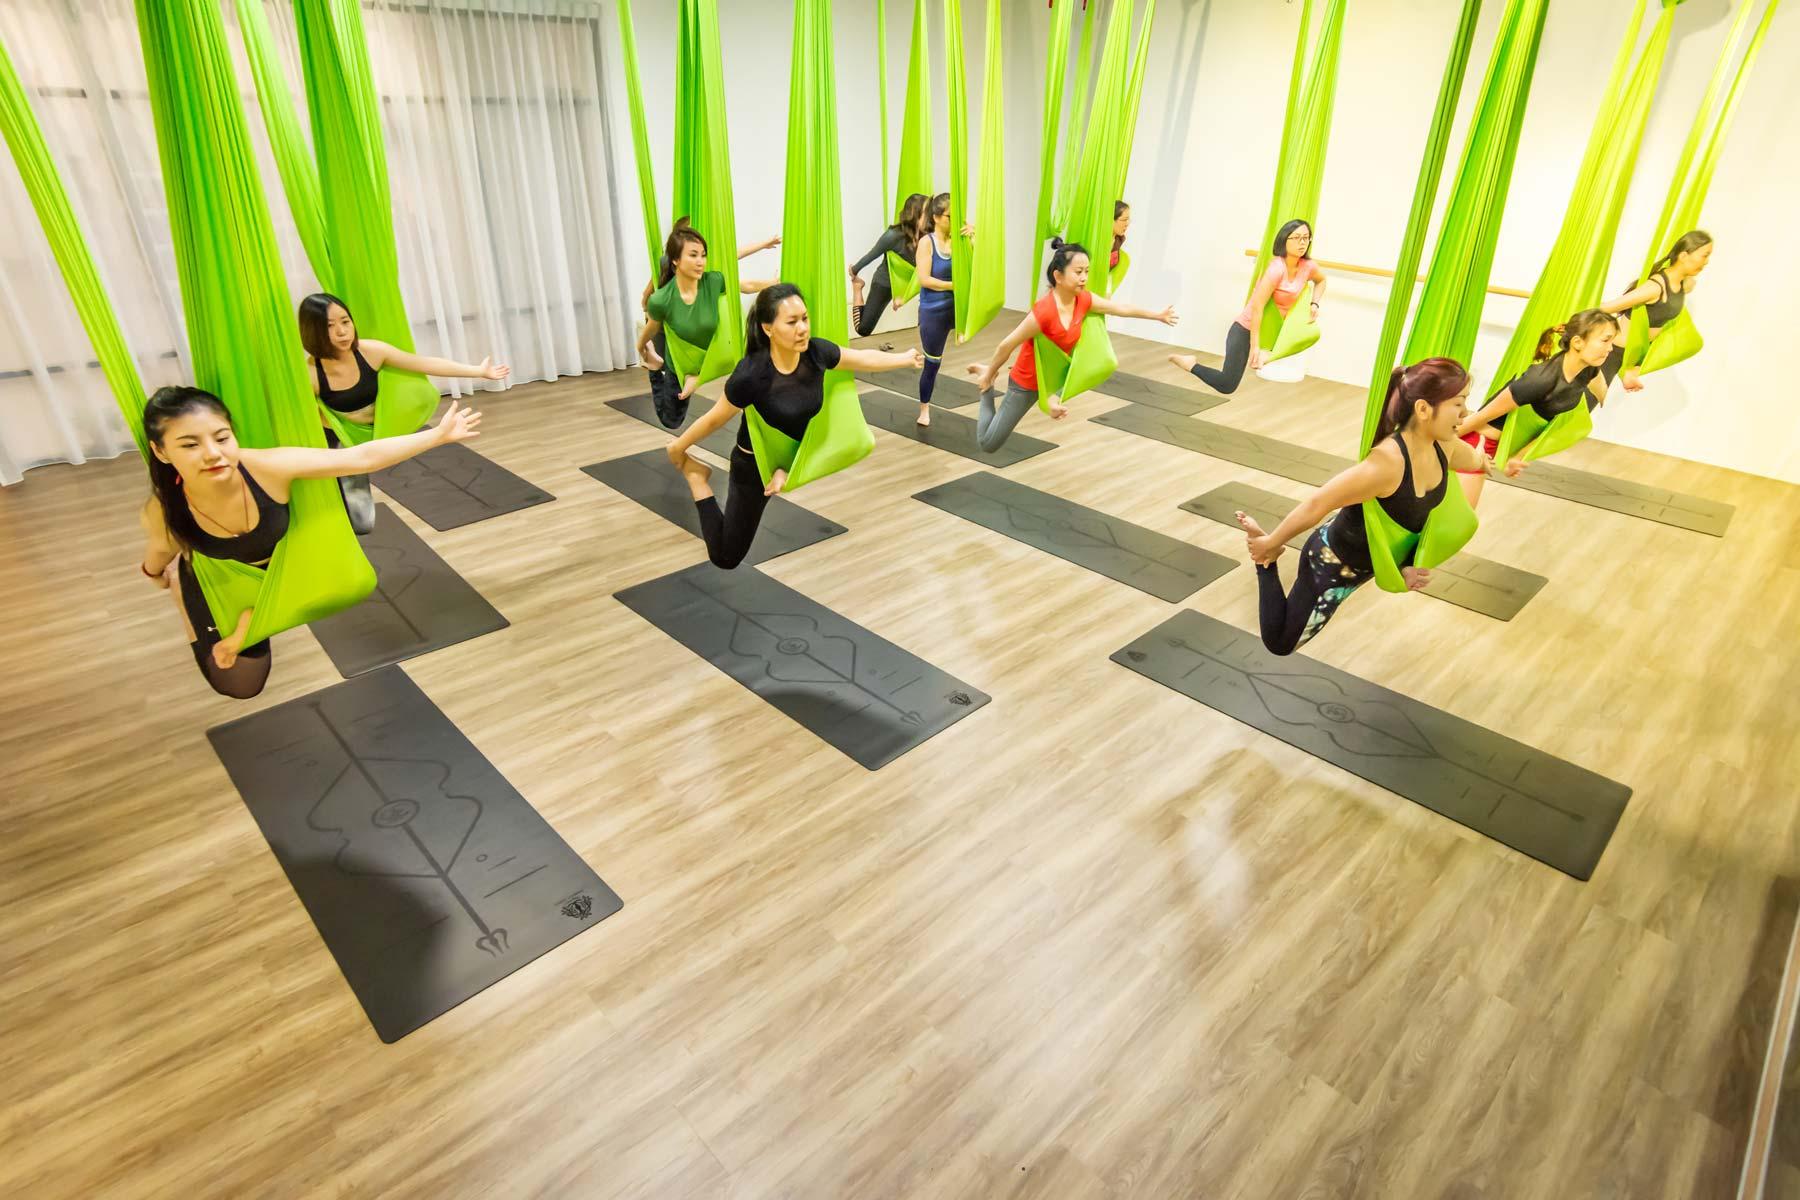 Aerial Yoga class at Dream Dance and Yoga studio in Singapore